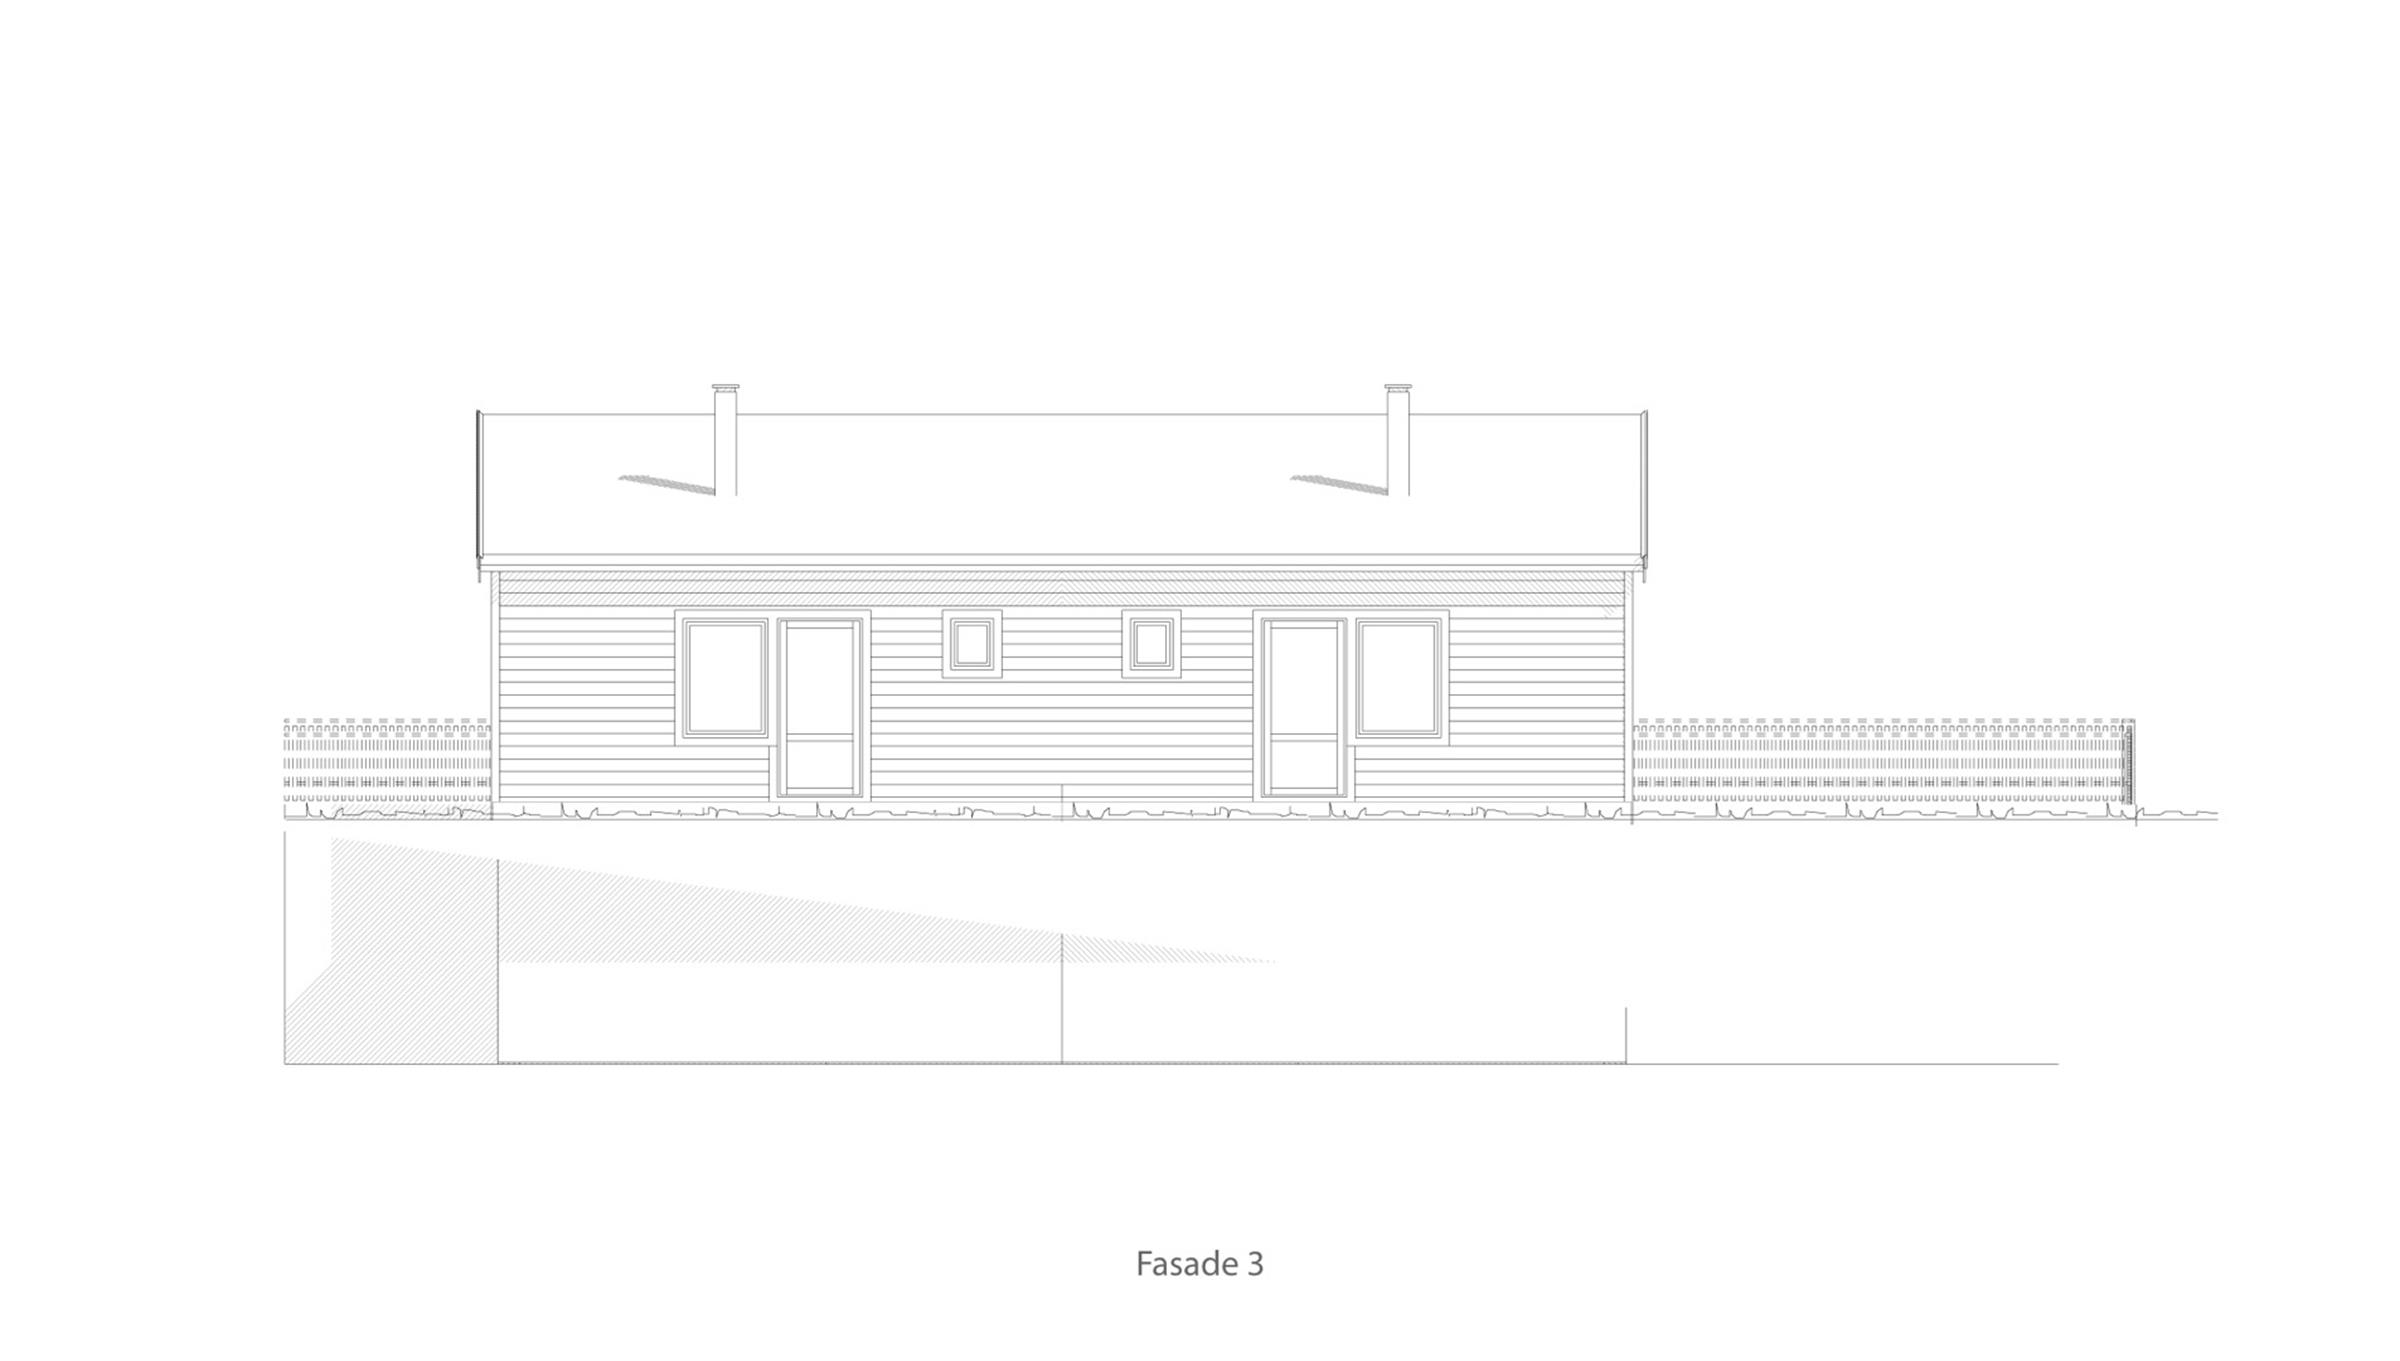 Bryne fasade 3